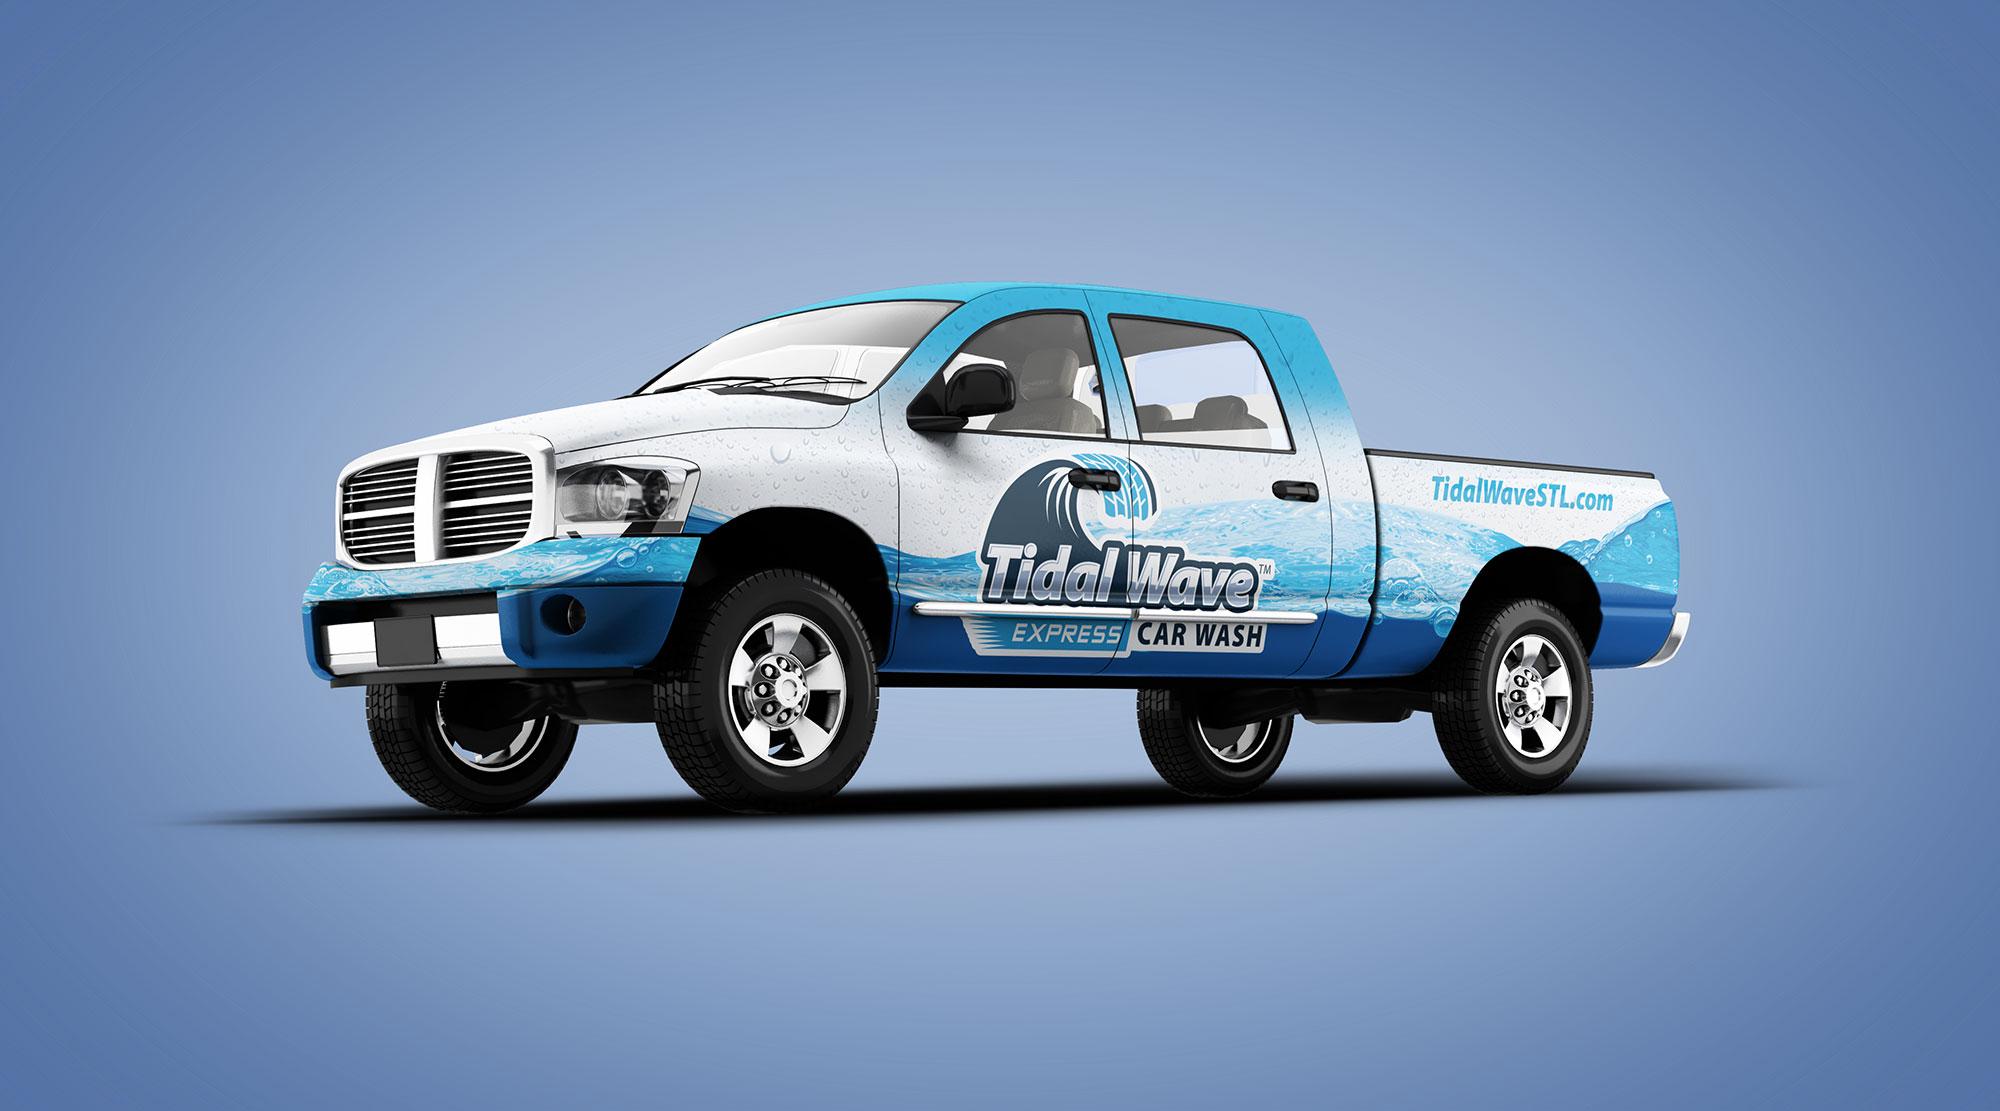 Tidal truck vehicle wrap design